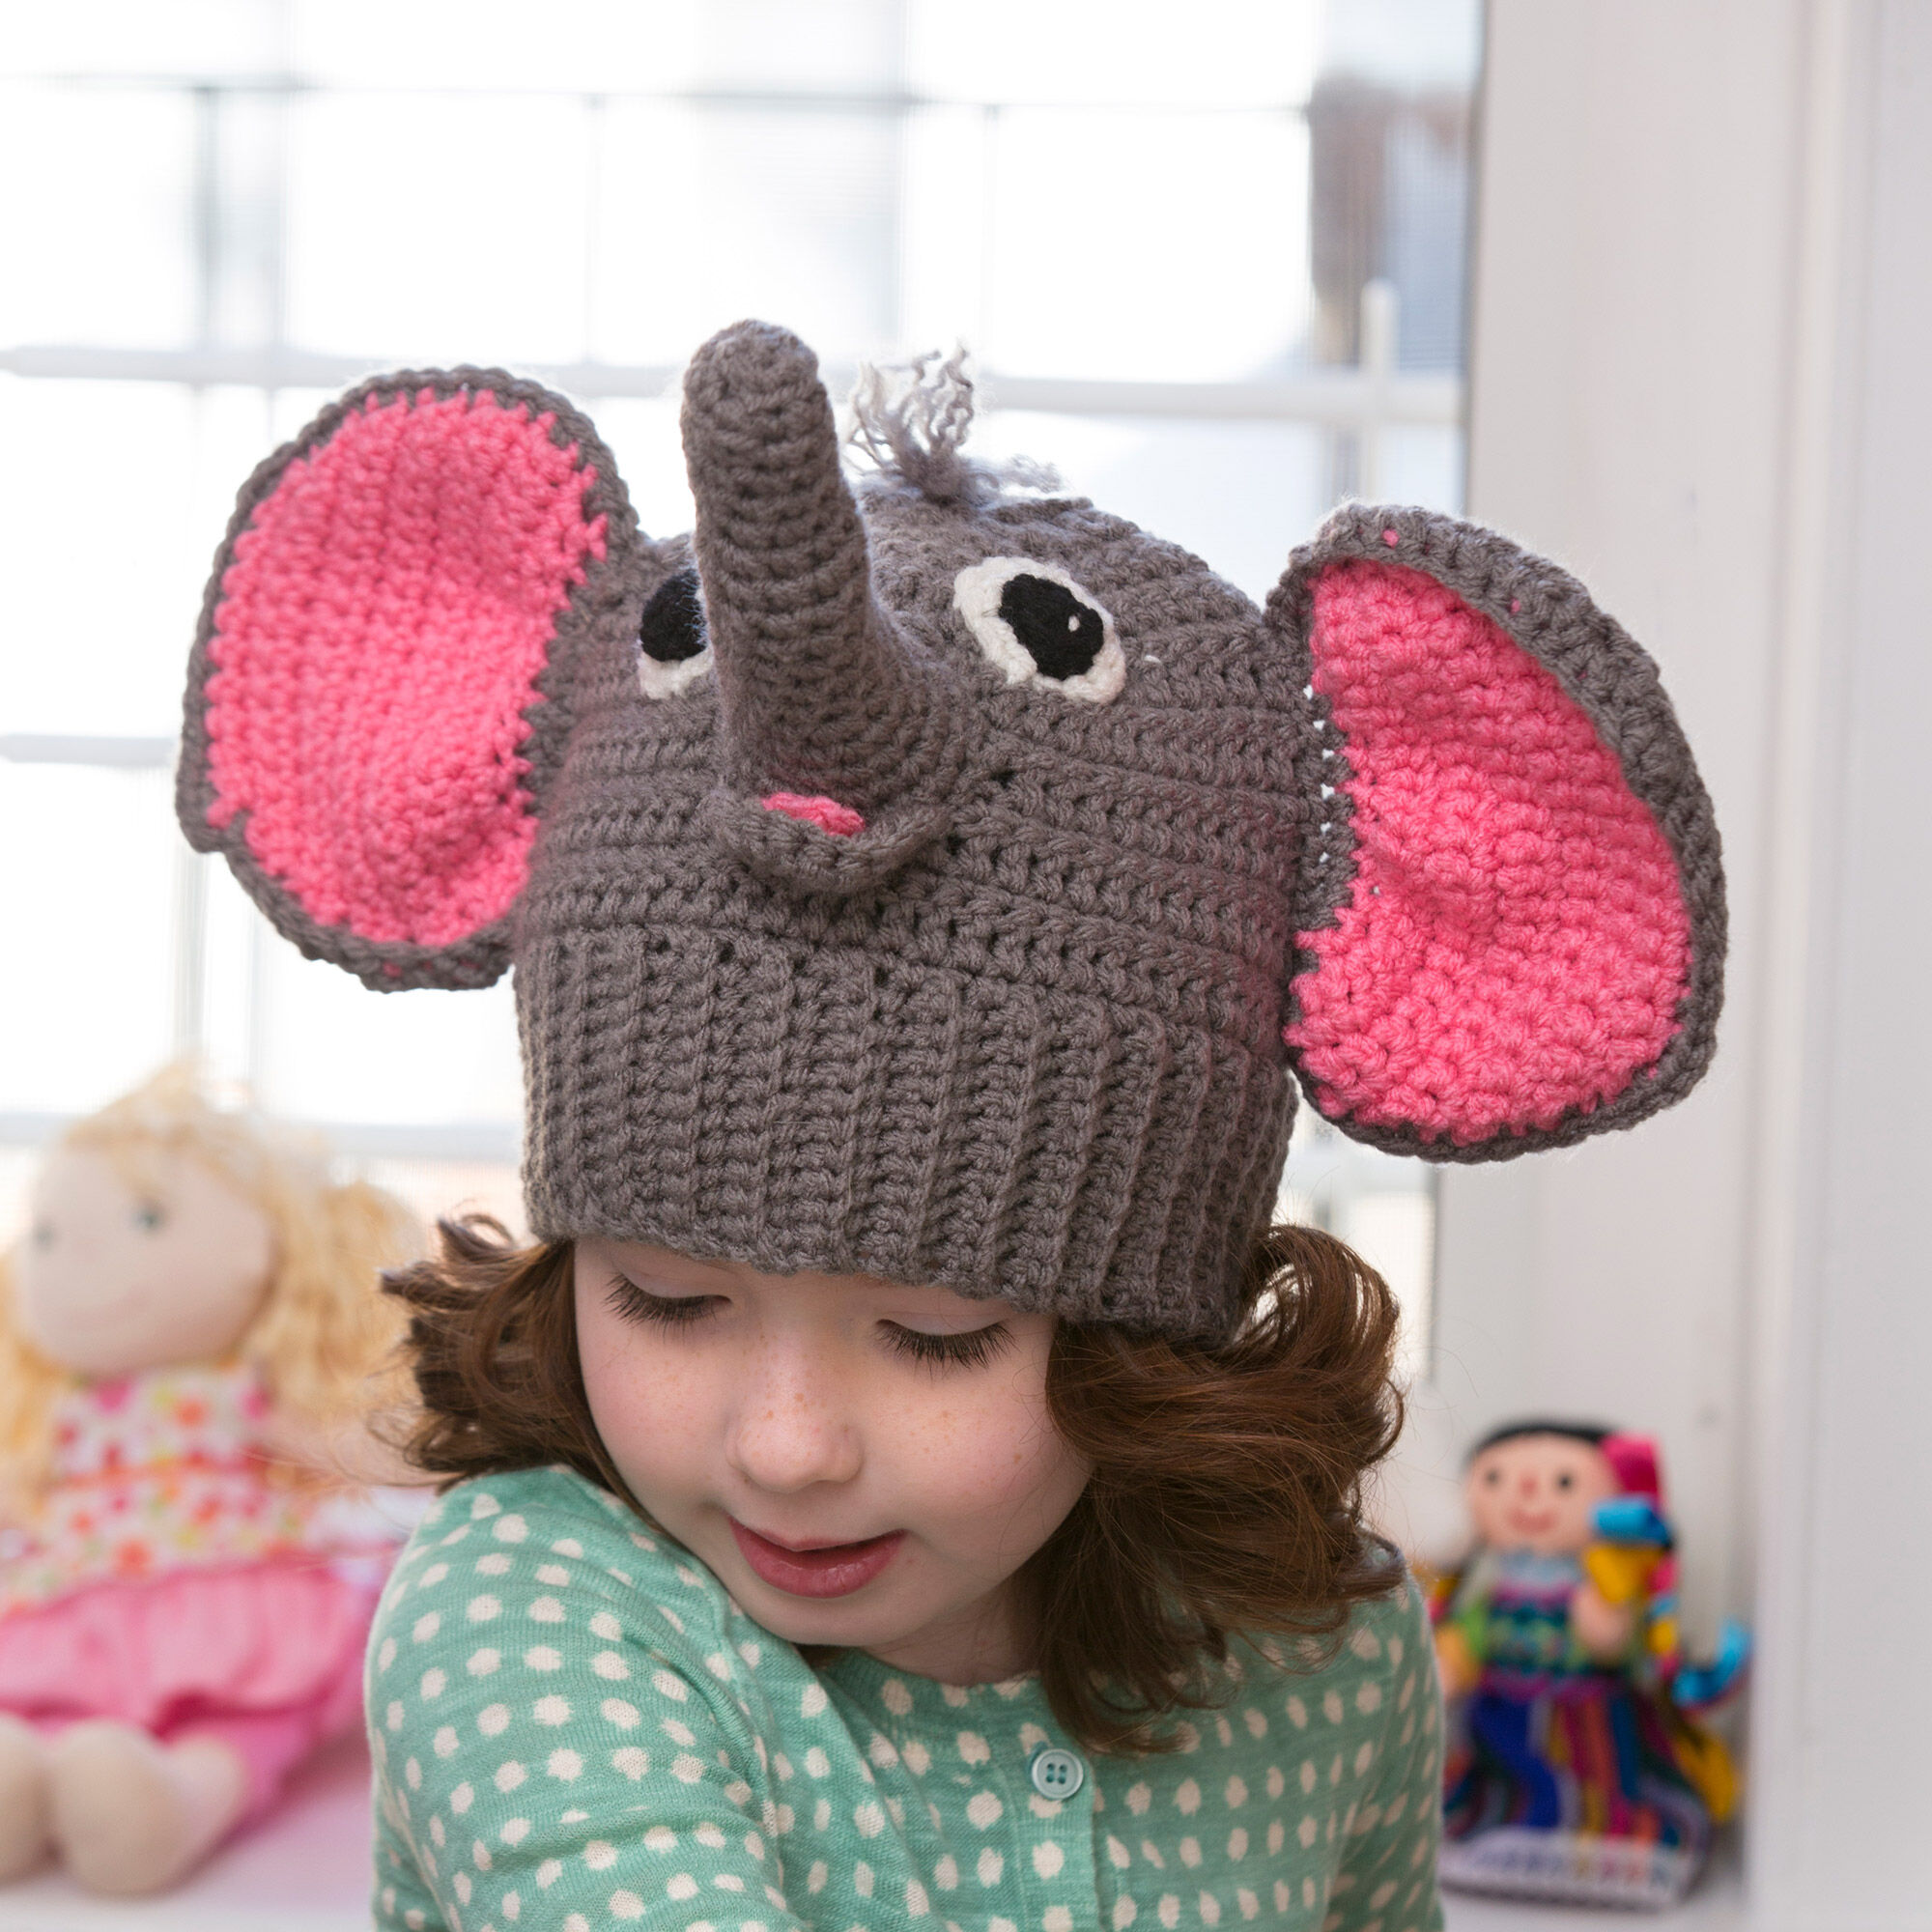 Preemie Newborn Elephant Hat Crochet Pattern | Cream Of The Crop ... | 2000x2000